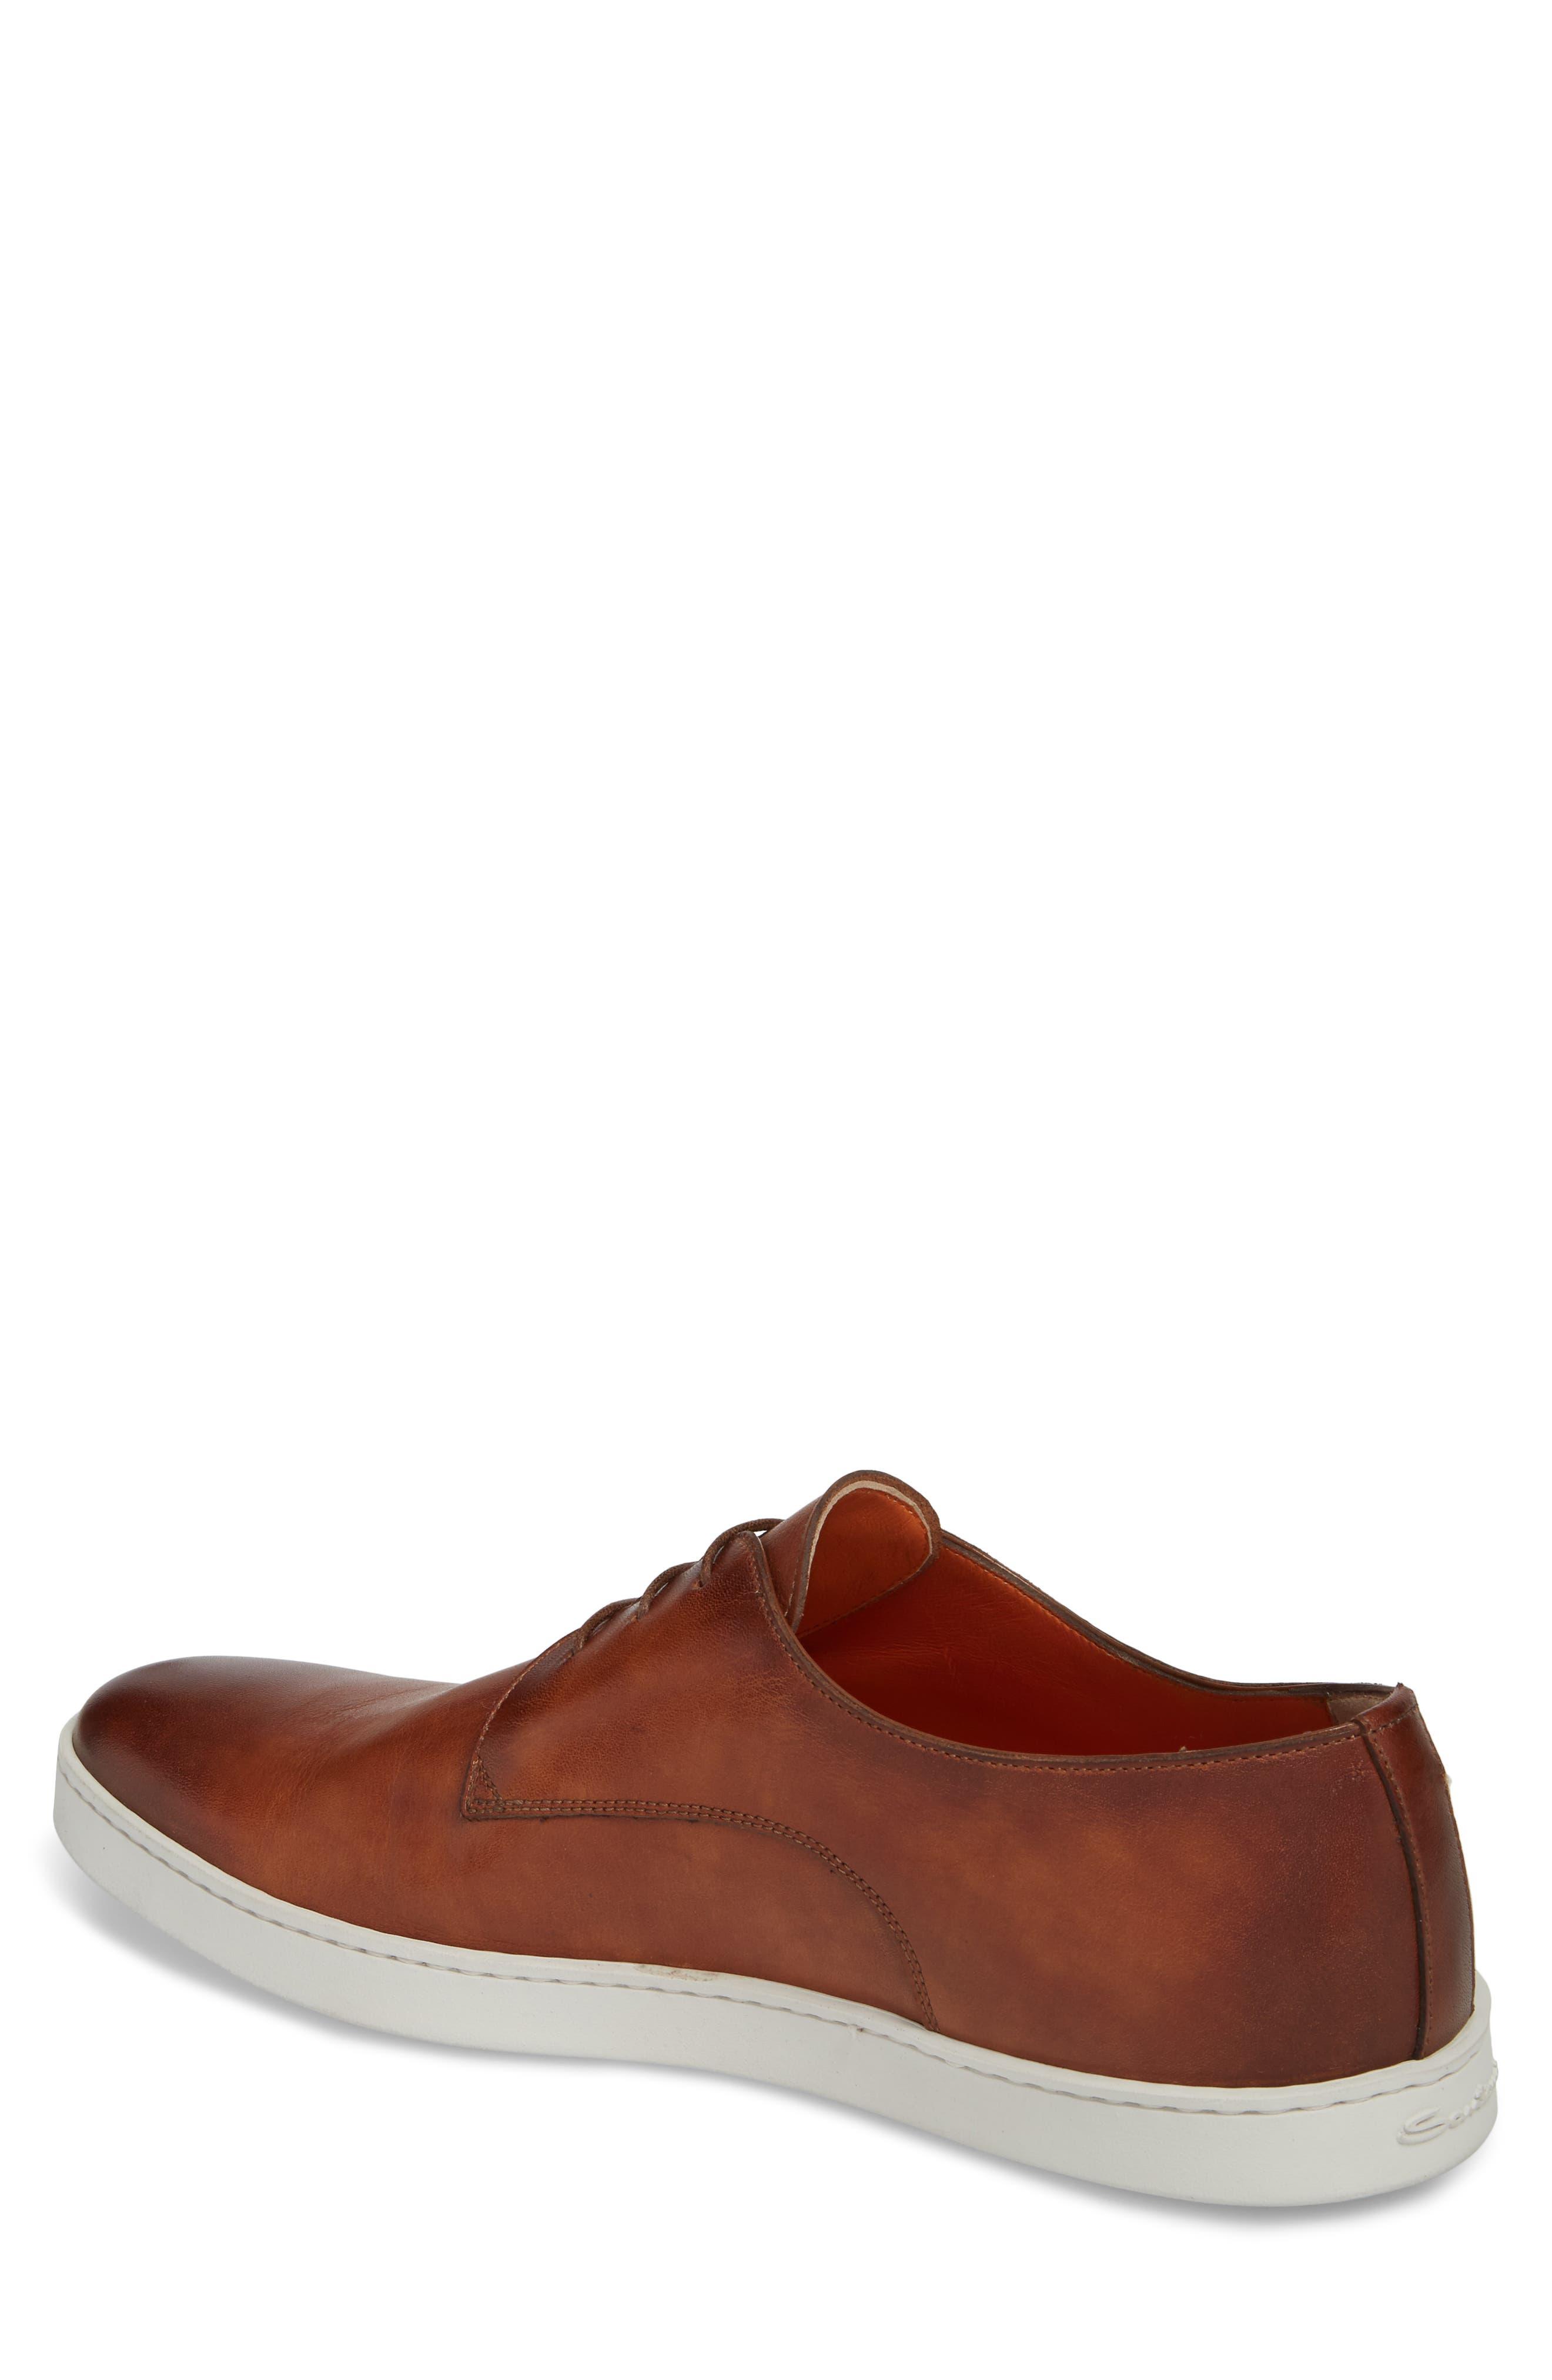 Doyle Plain Toe Derby Sneaker,                             Alternate thumbnail 2, color,                             TAN